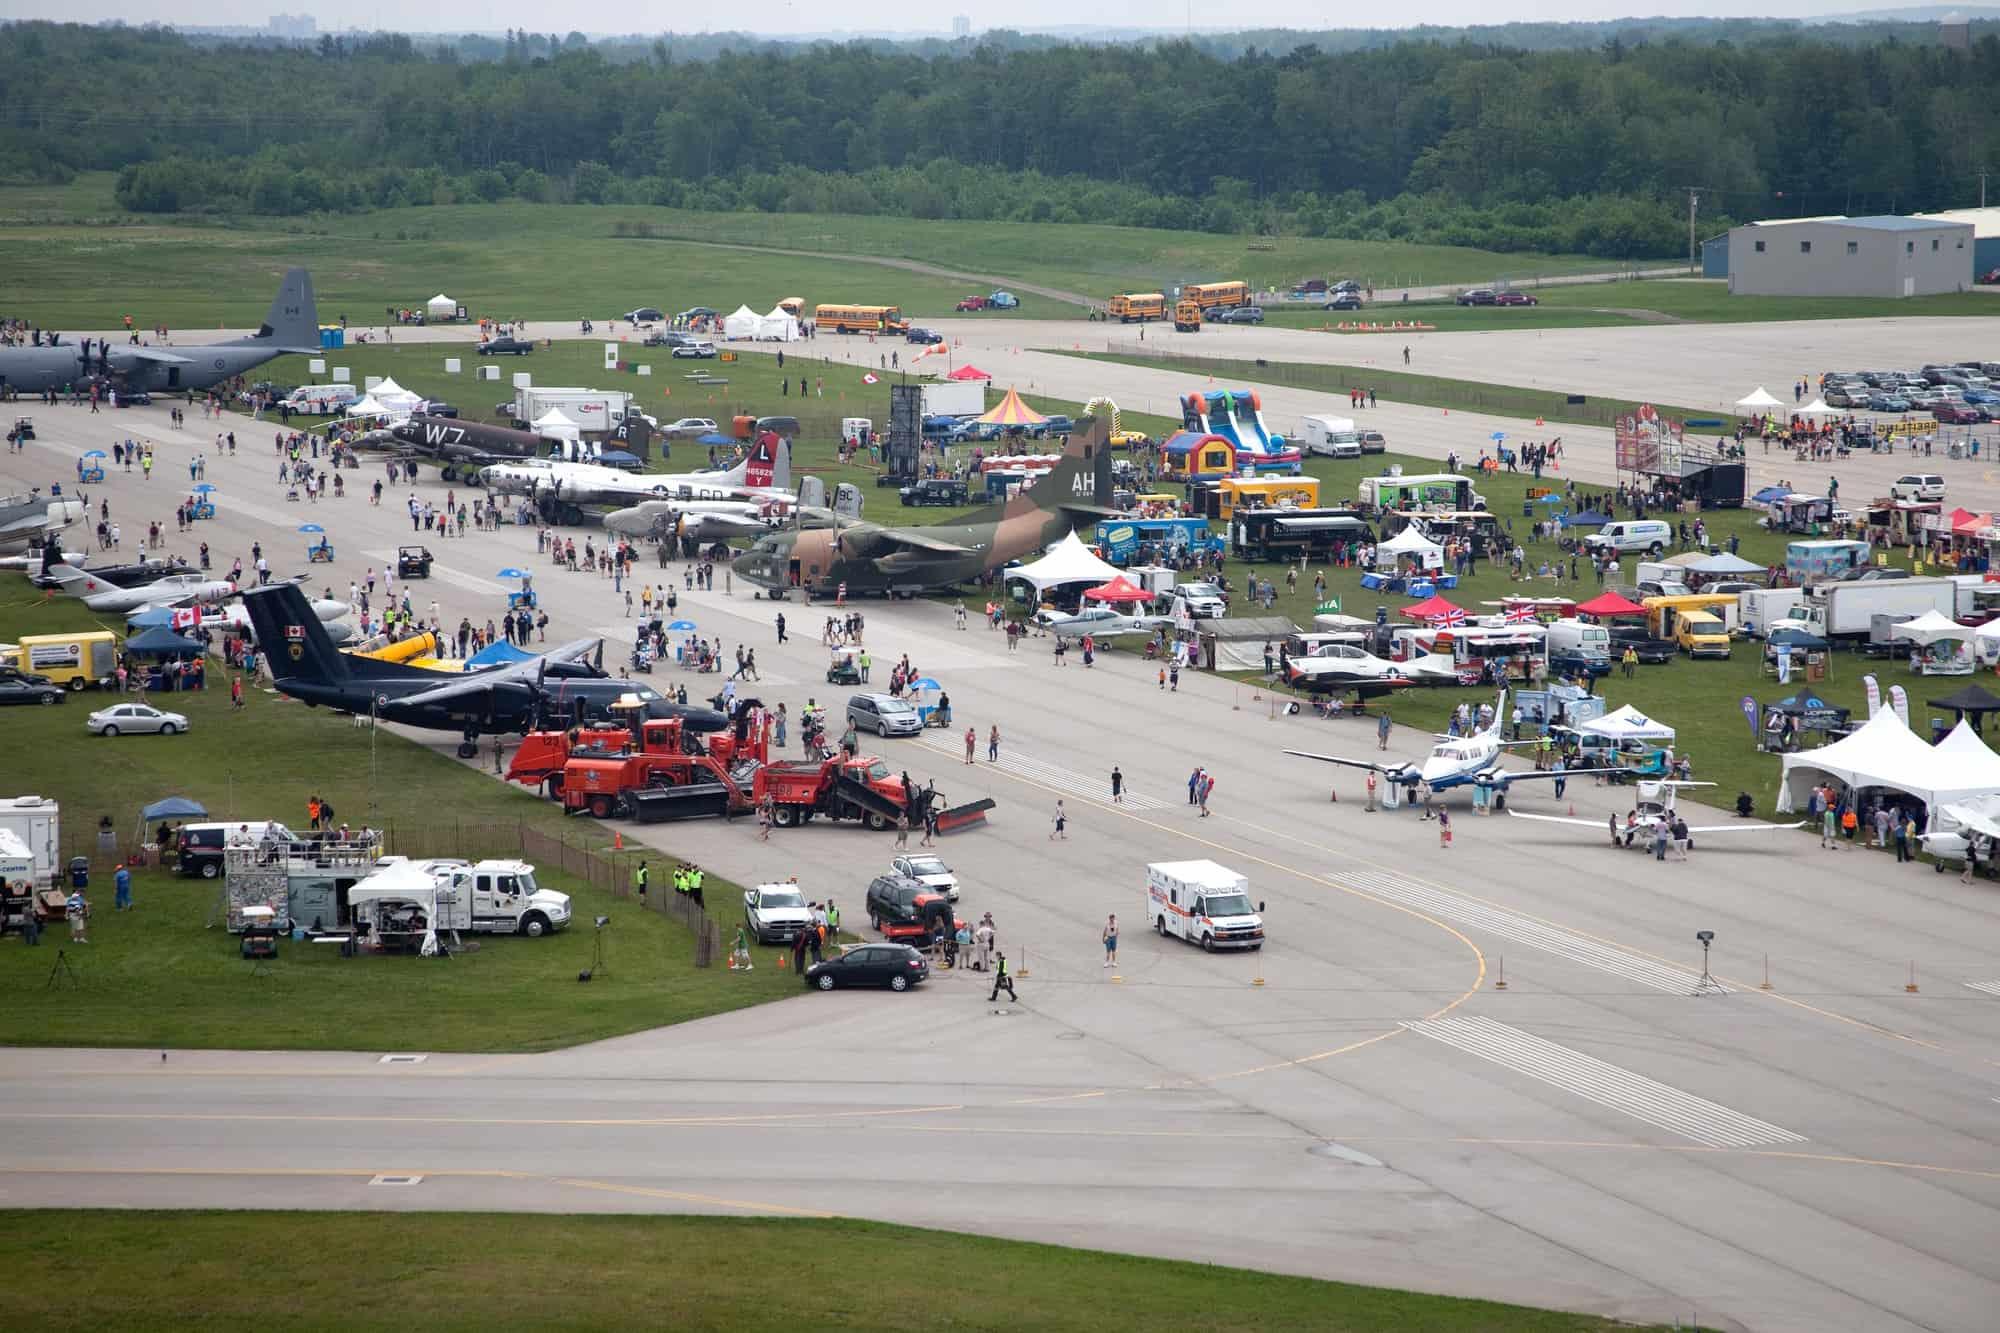 Waterloo Air show 2014